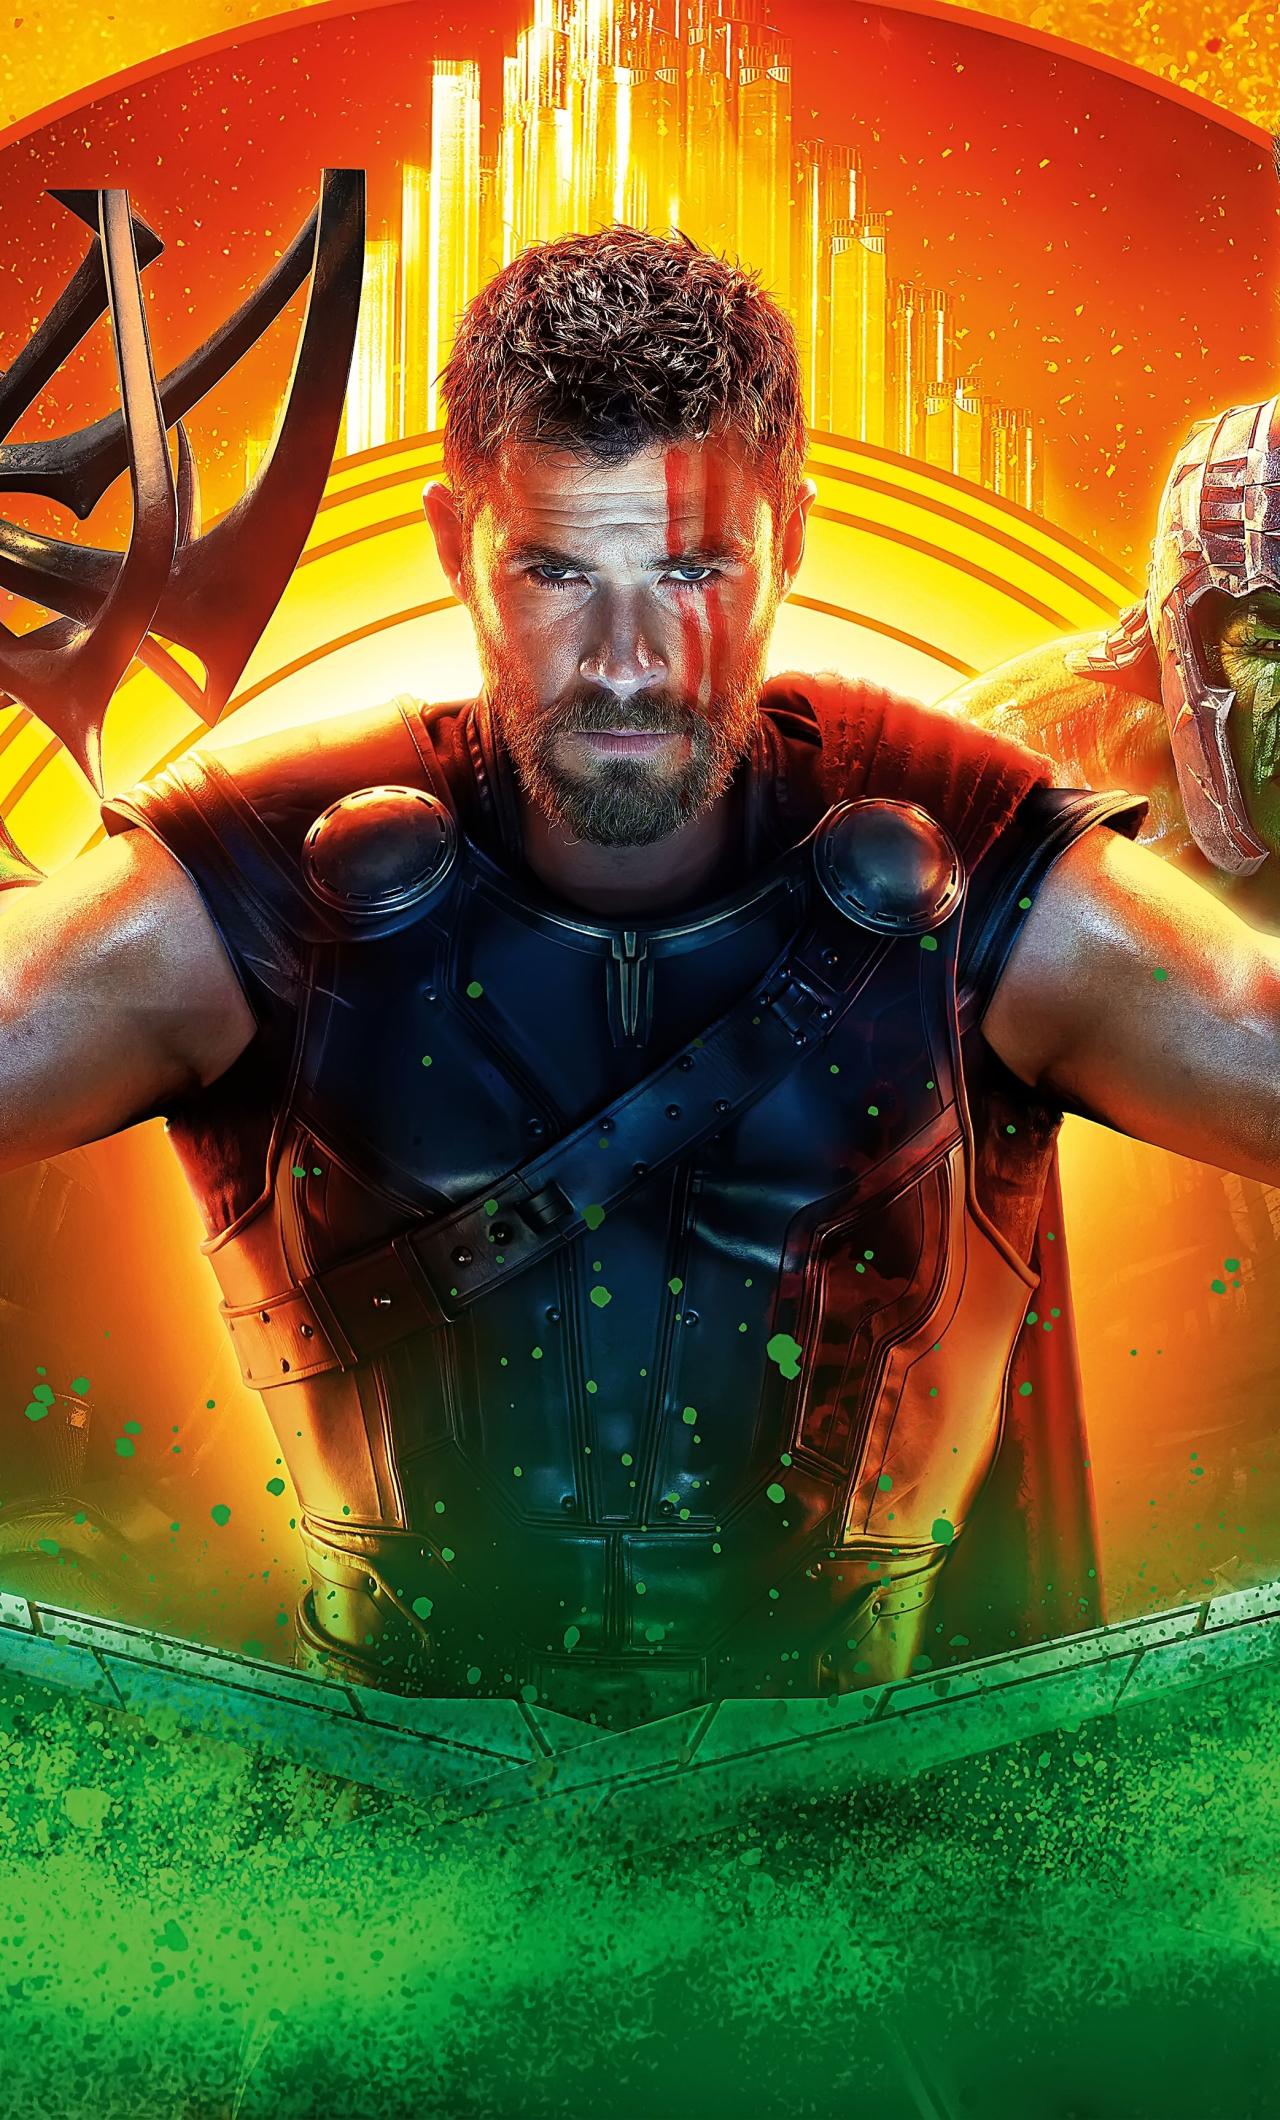 Download thor ragnarok 2017 movie 2017 1680x1050 - Thor ragnarok hd wallpapers download ...